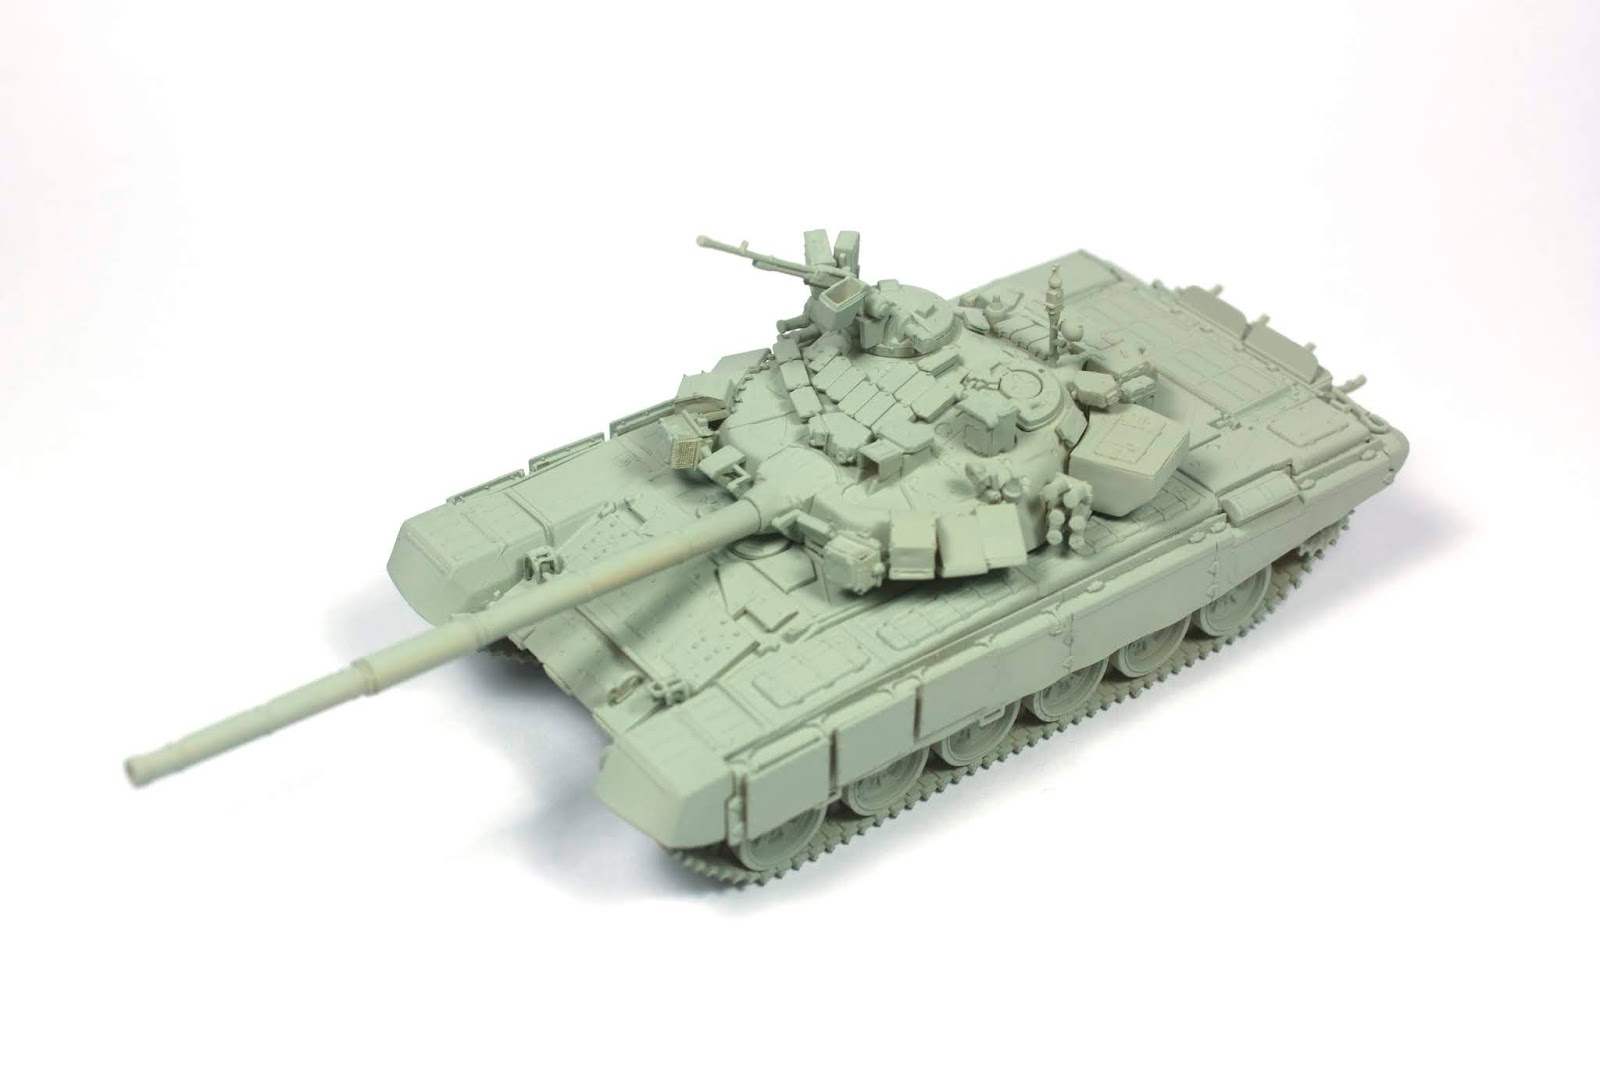 T-90_%25C3%2596zg%25C3%25BCr_AYDIN+%2528